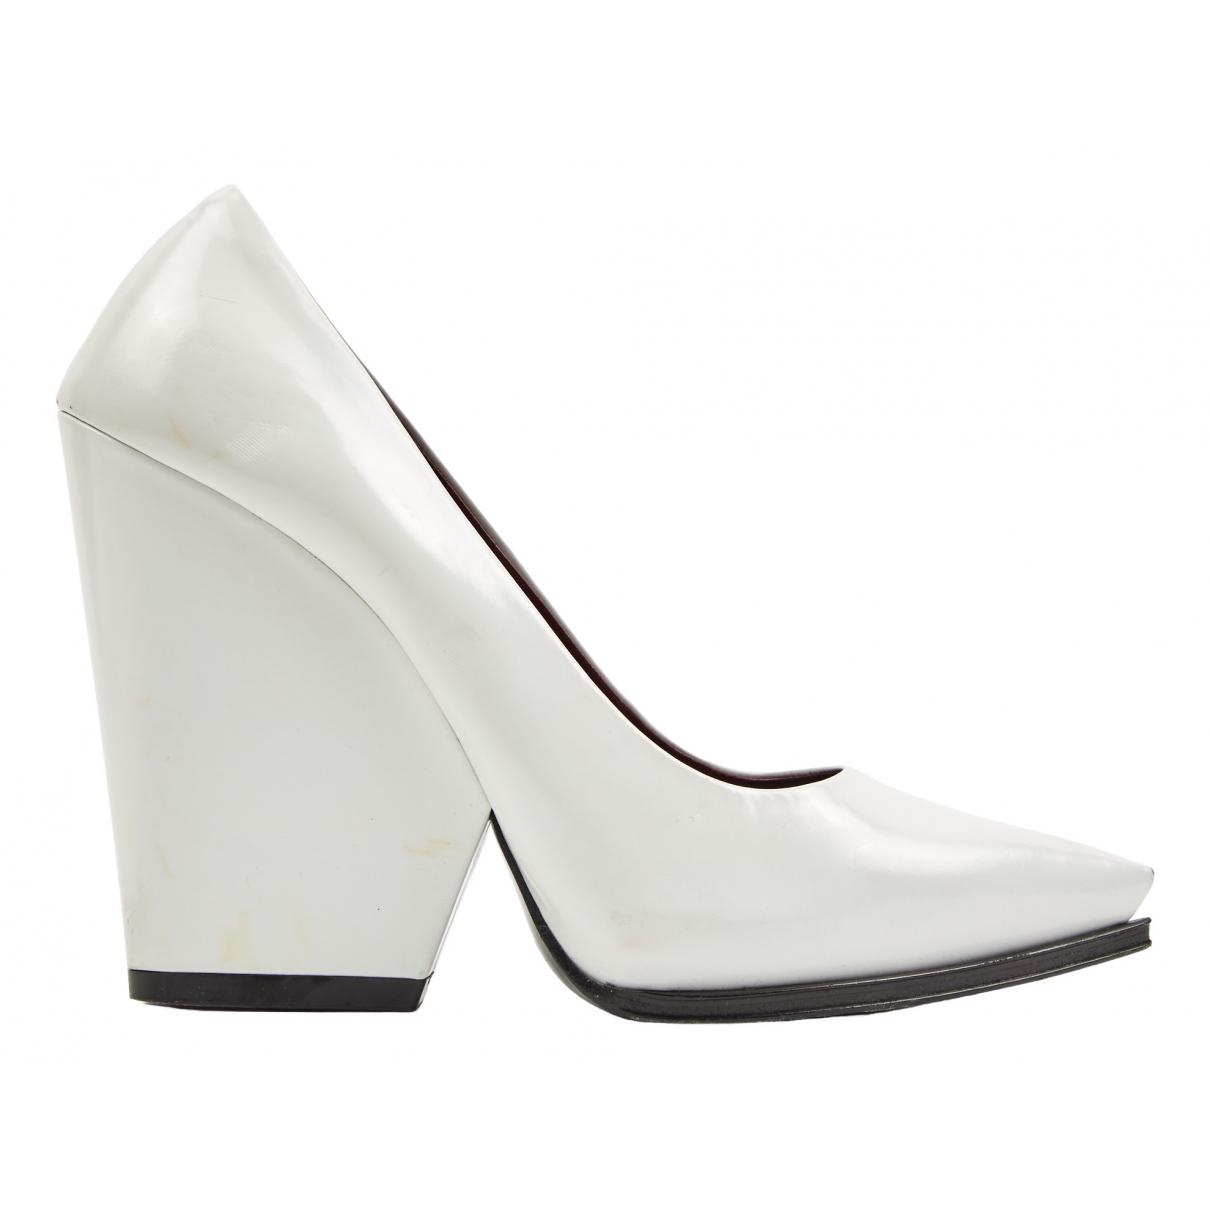 Celine \N White Leather Heels for Women 38.5 EU